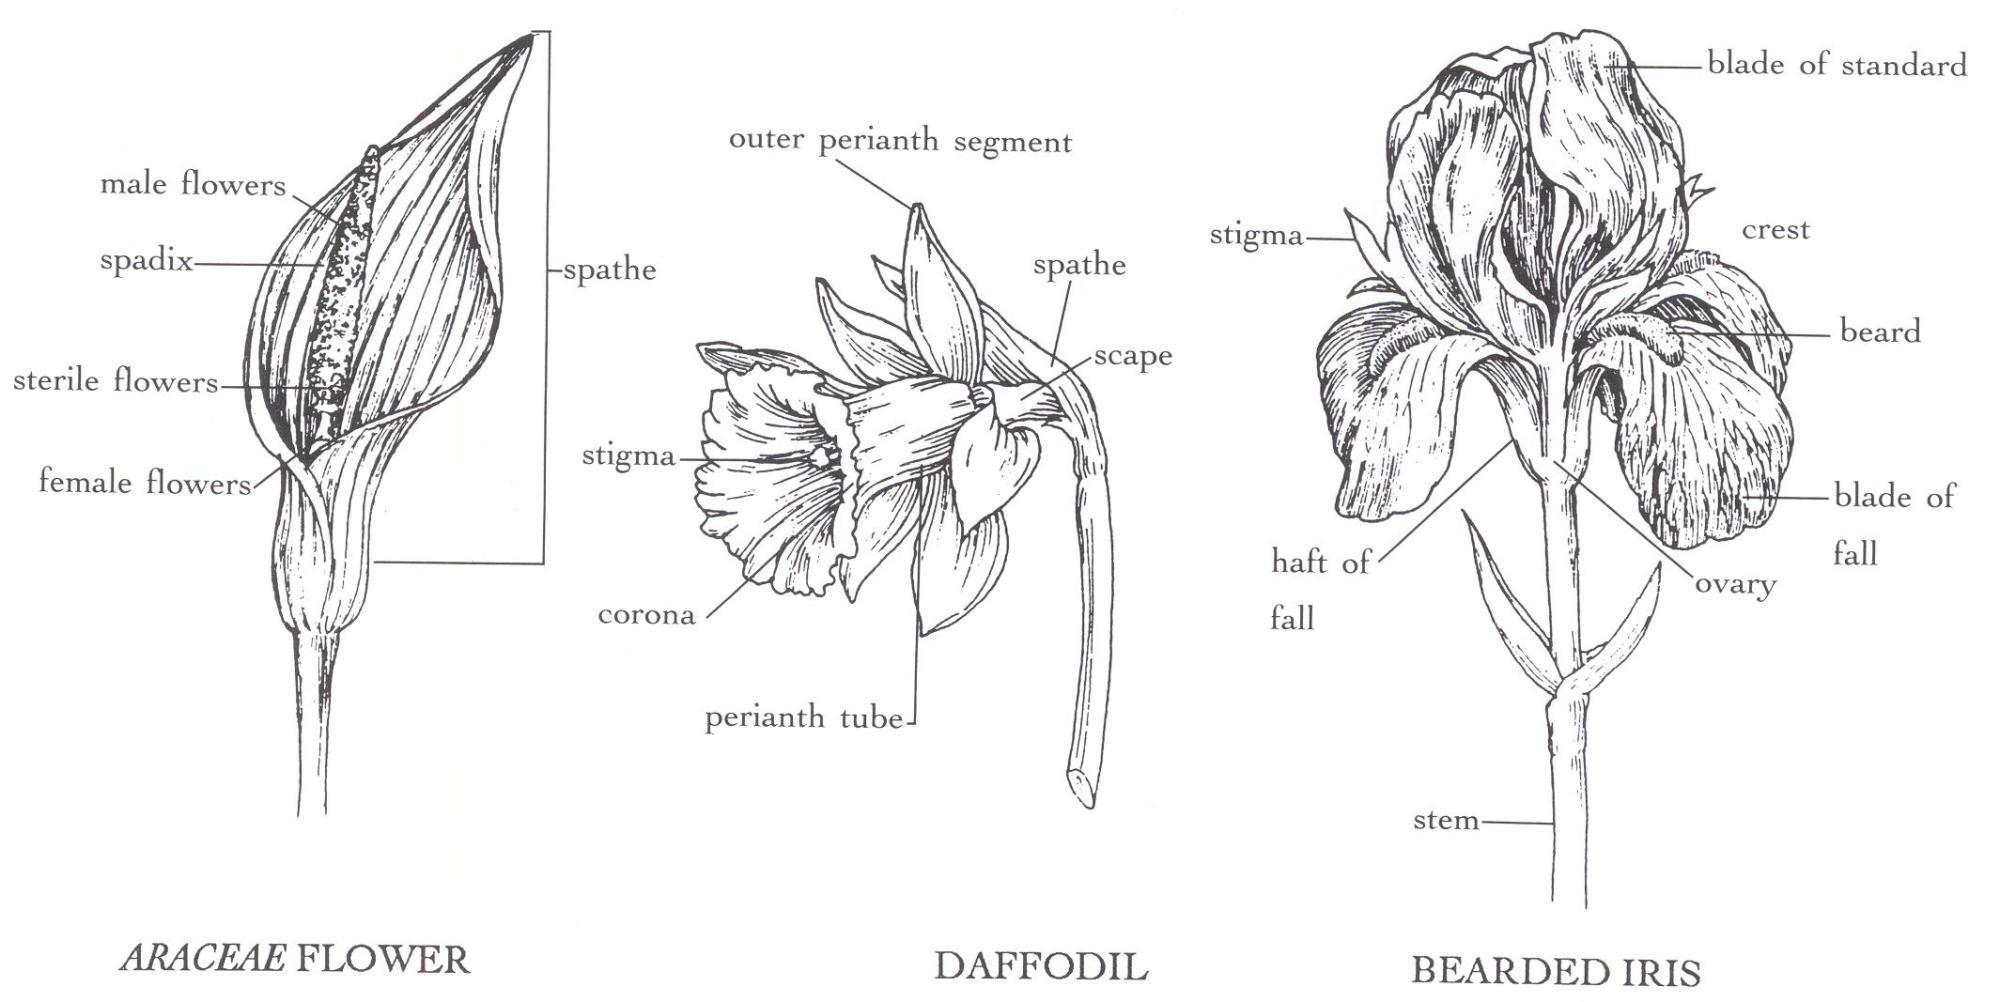 hight resolution of araceae flower daffodil bearded iris